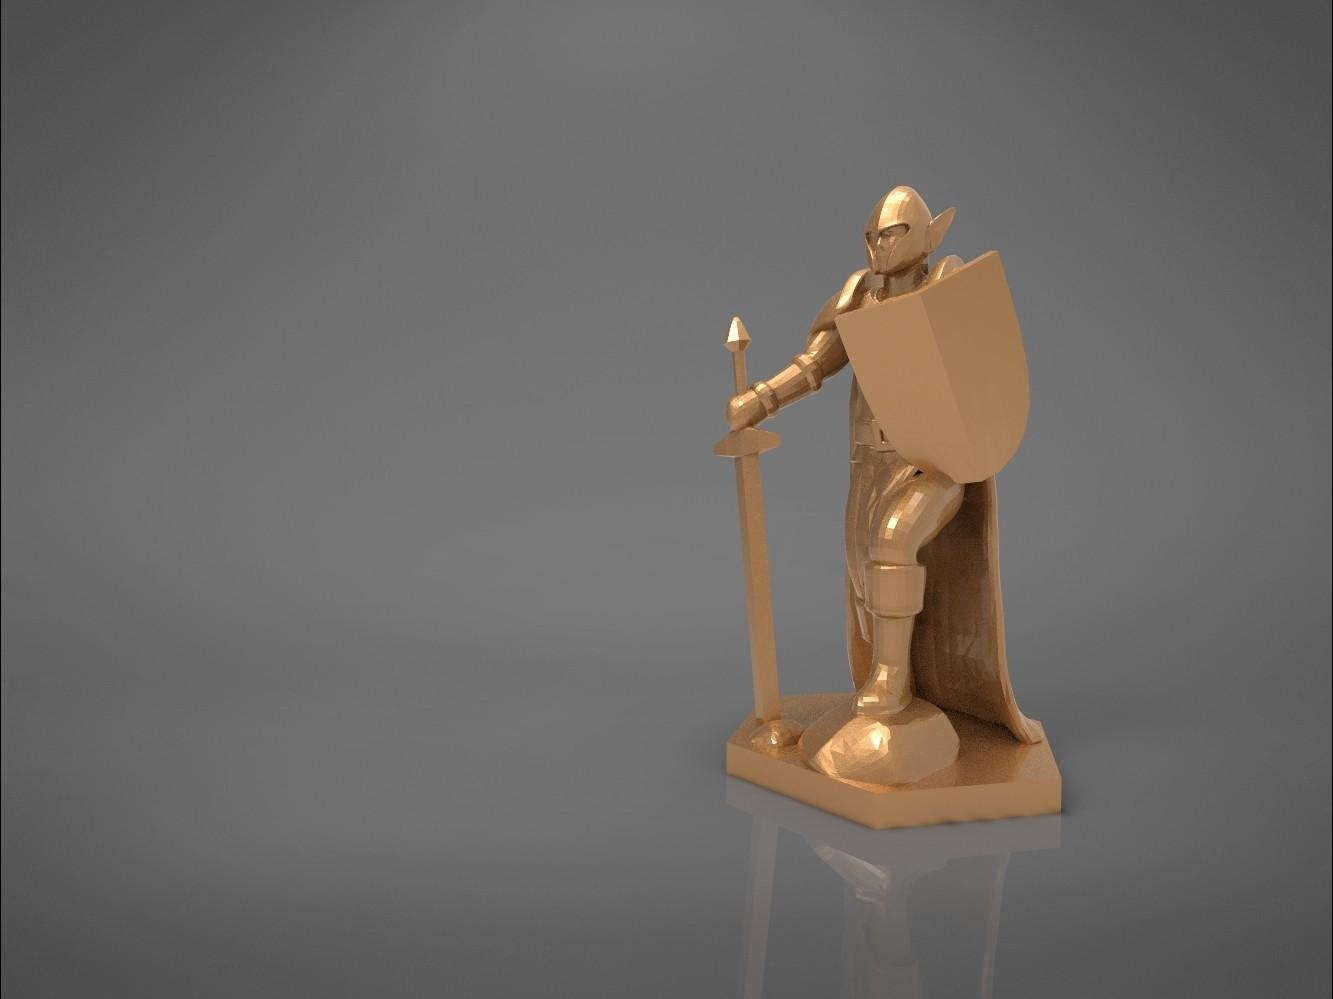 Warrior-main_render.398.jpg Download STL file ELF WARRIOR CHARACTER GAME FIGURE 3D print model • Object to 3D print, 3D-mon